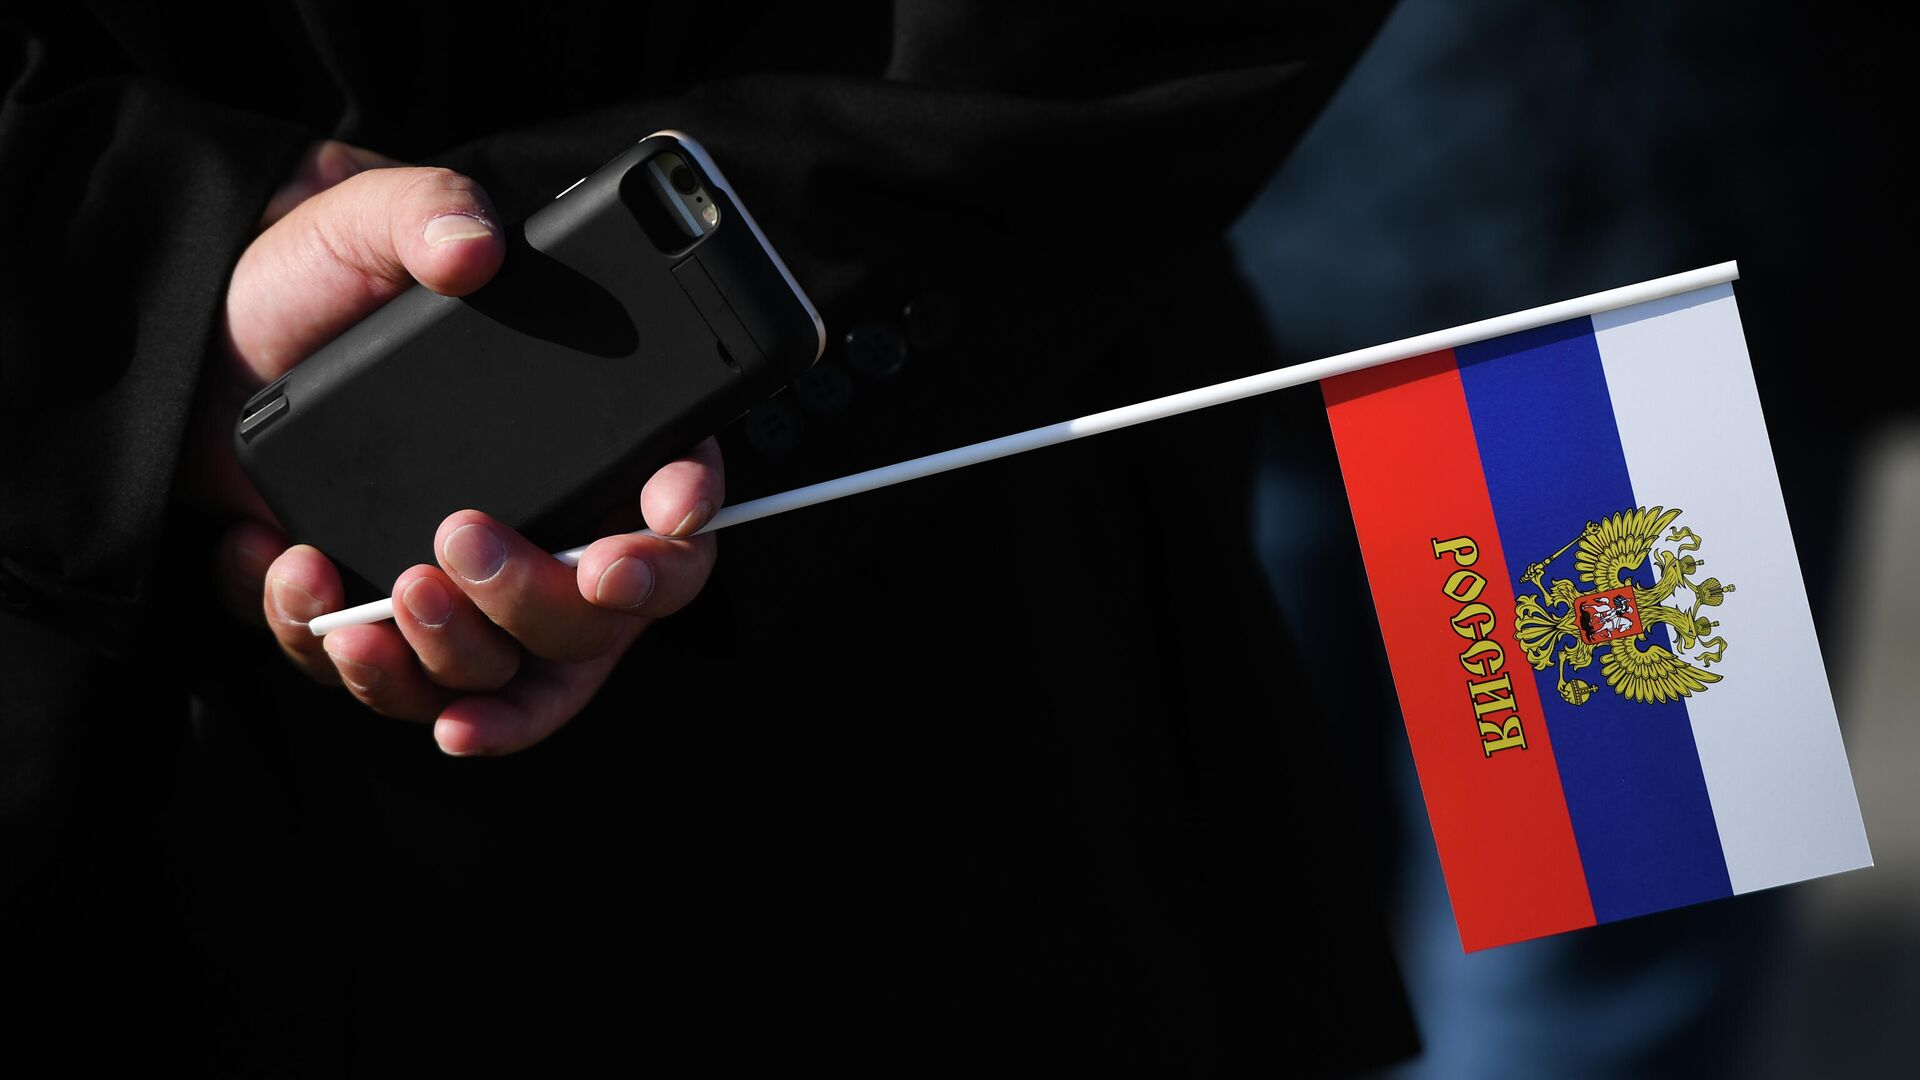 Празднование Дня государственного флага Российской Федерации на площади Маркса в Новосибирске - РИА Новости, 1920, 18.09.2020